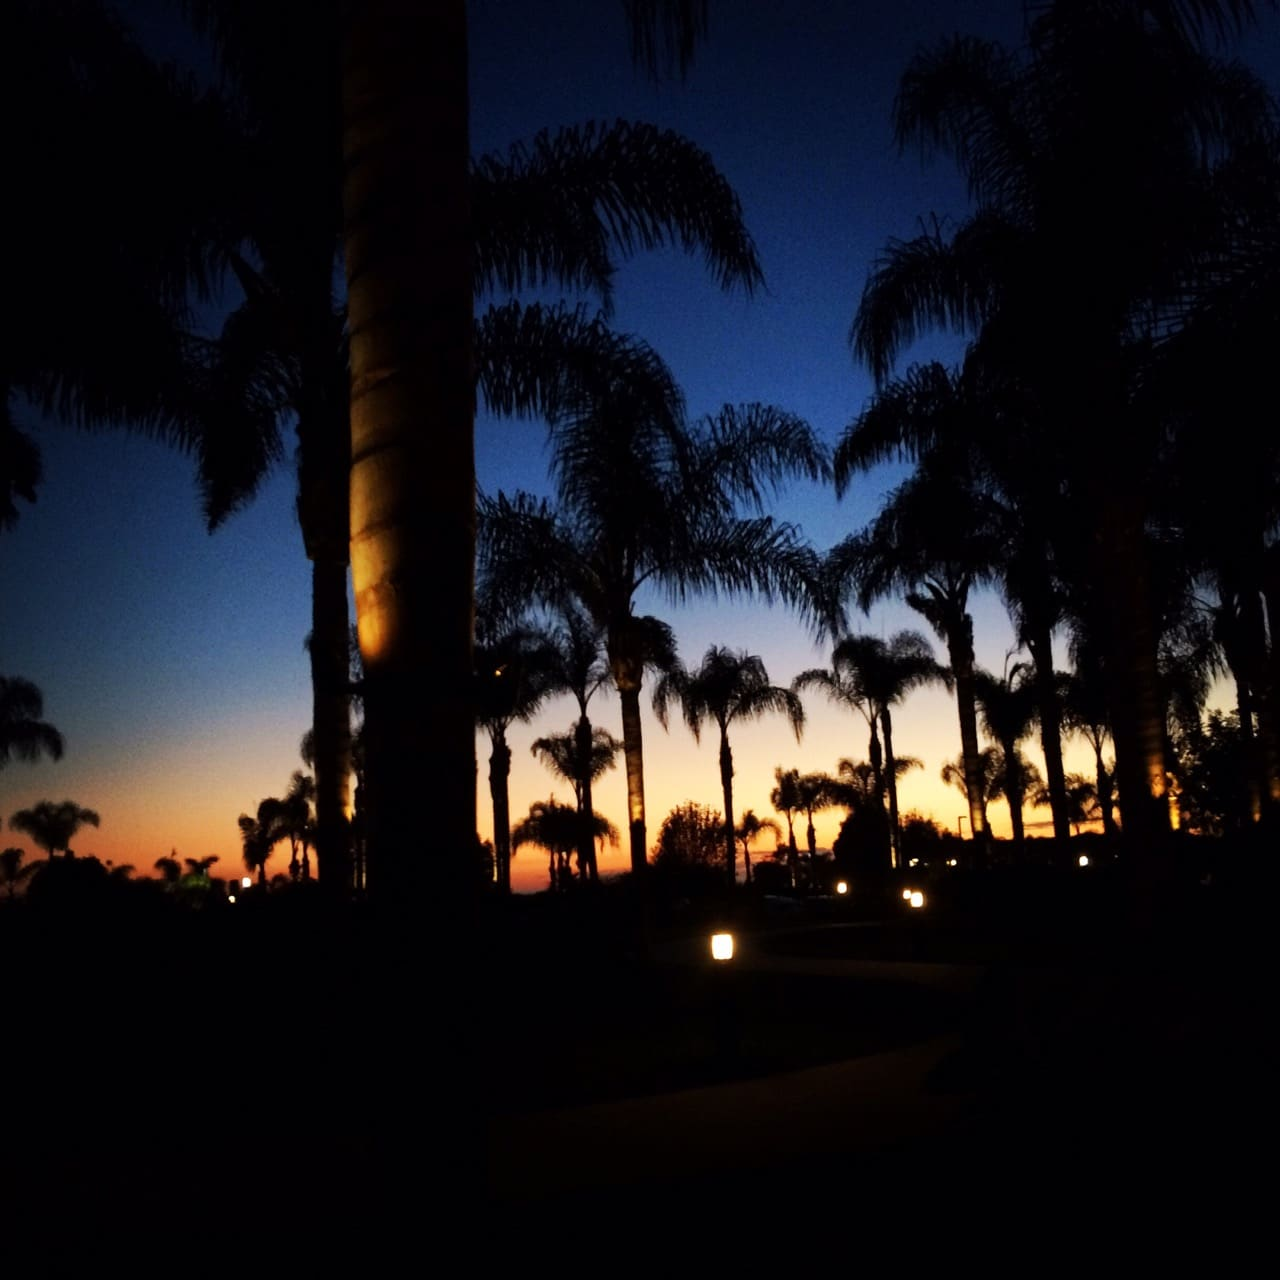 Sunset-carlsbad-sheraton